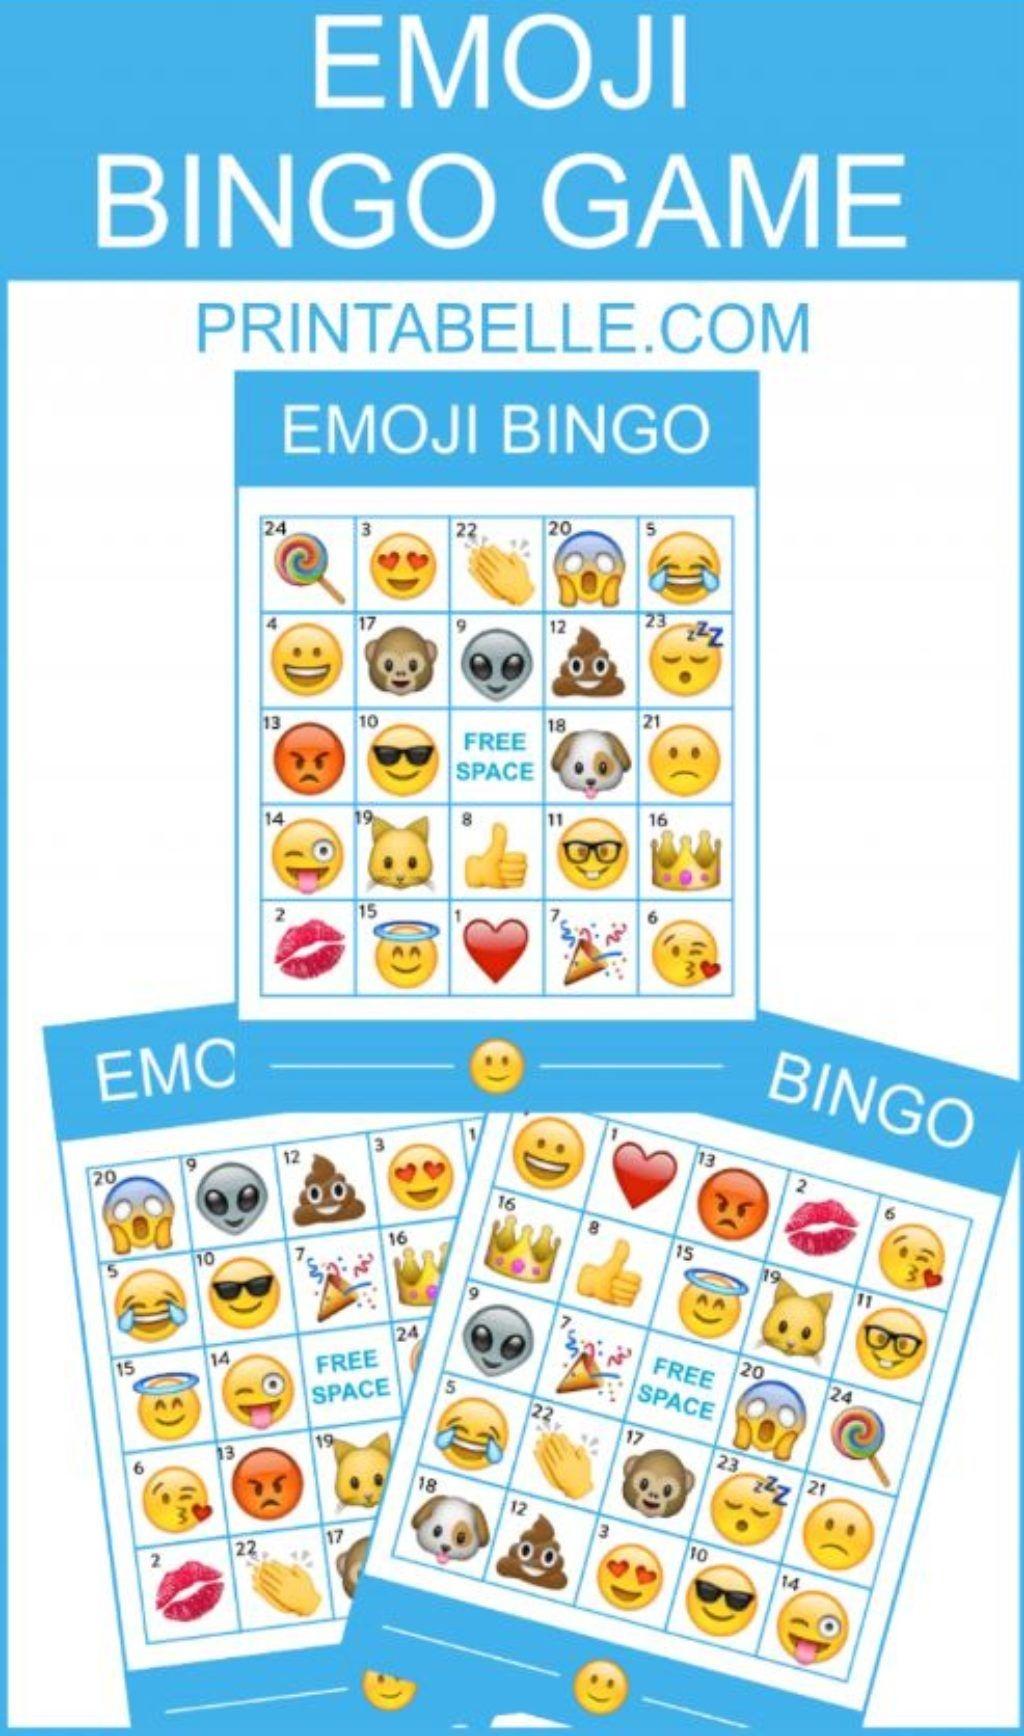 Emoji Bingo Game With Apple Emojis | Free Party Printables And More - Free Emoji Bingo Printable